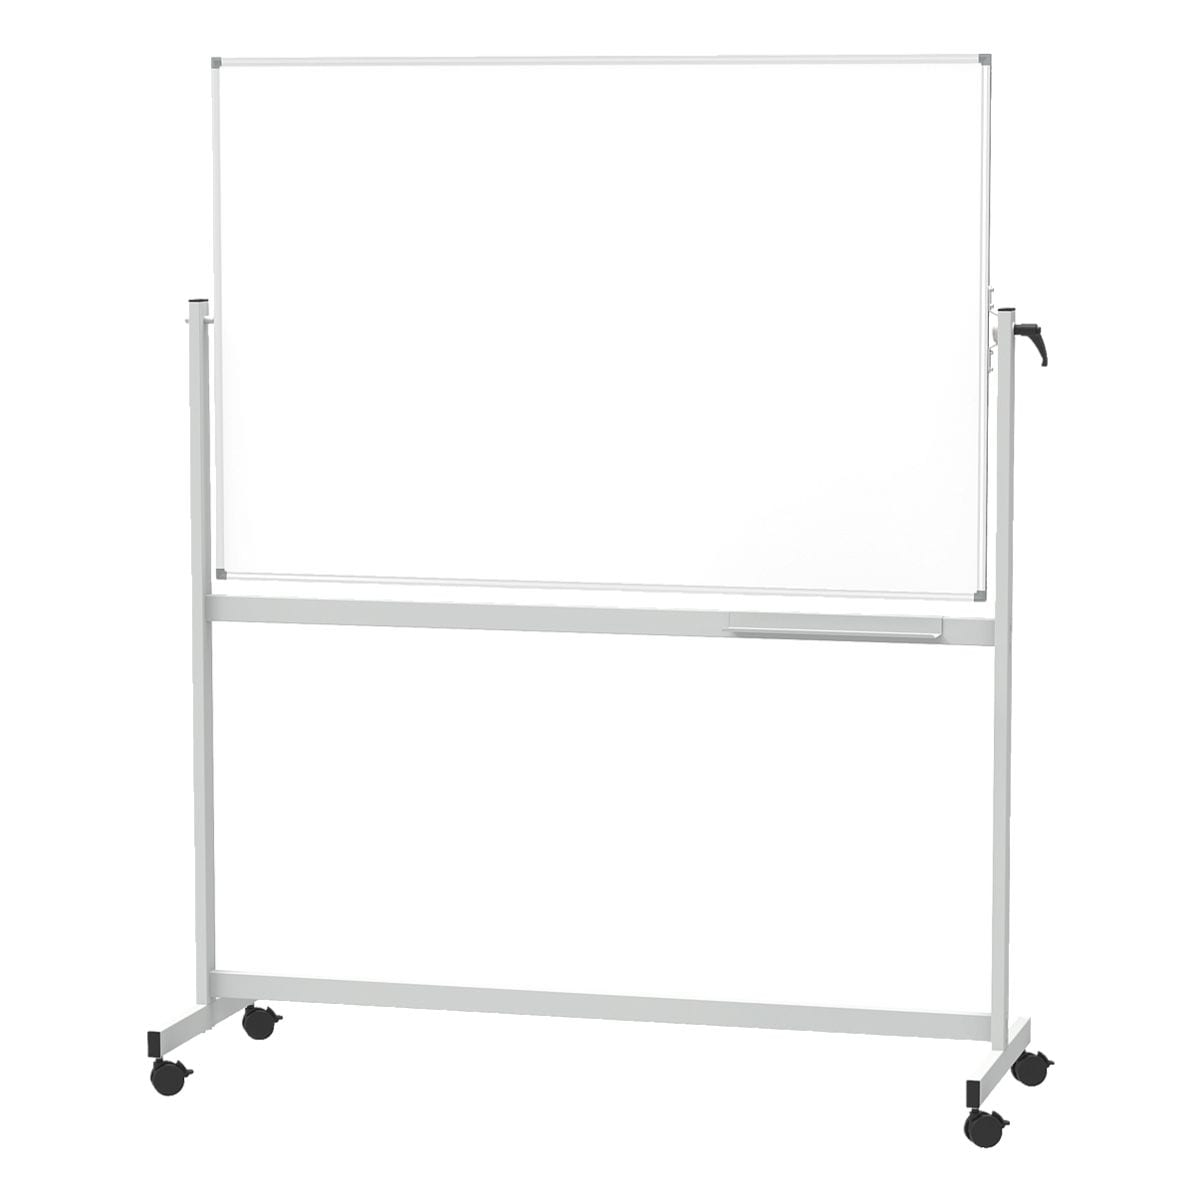 Maul Whiteboard Maul Standard 6460284 emailliert, 120x90 cm